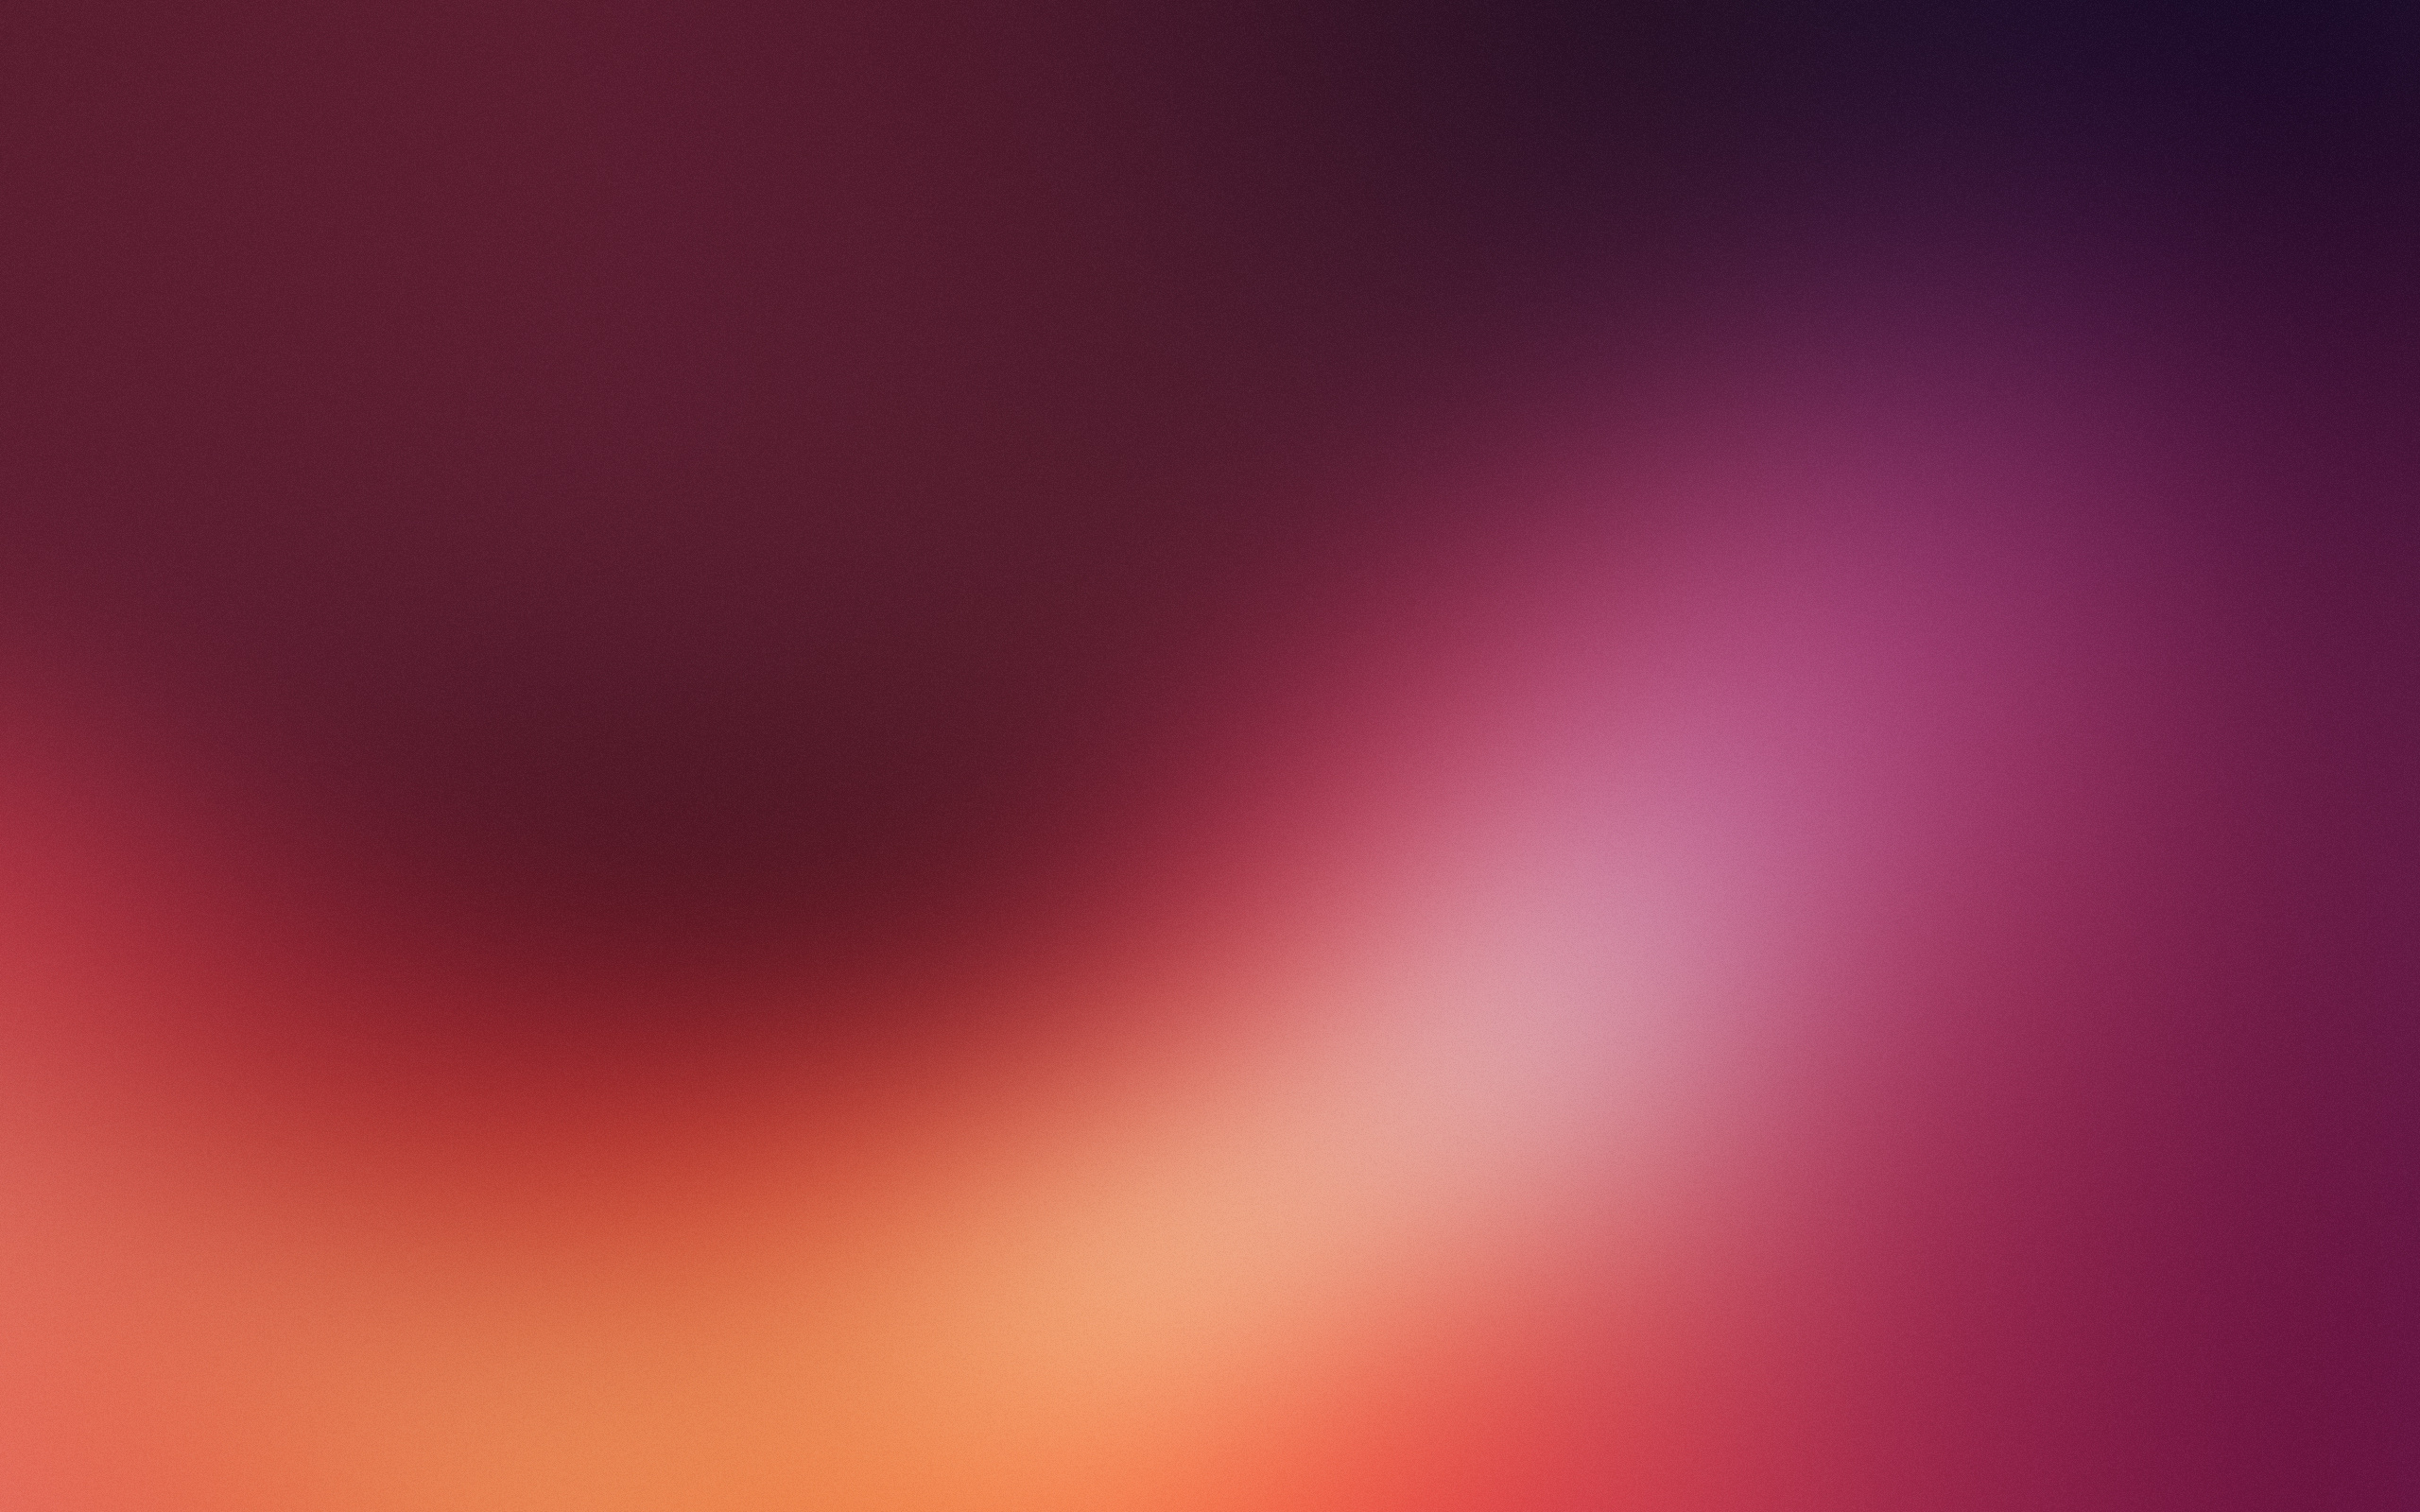 Ubuntu 1310 Default Wallpaper Leaked   Softpedia 2560x1600